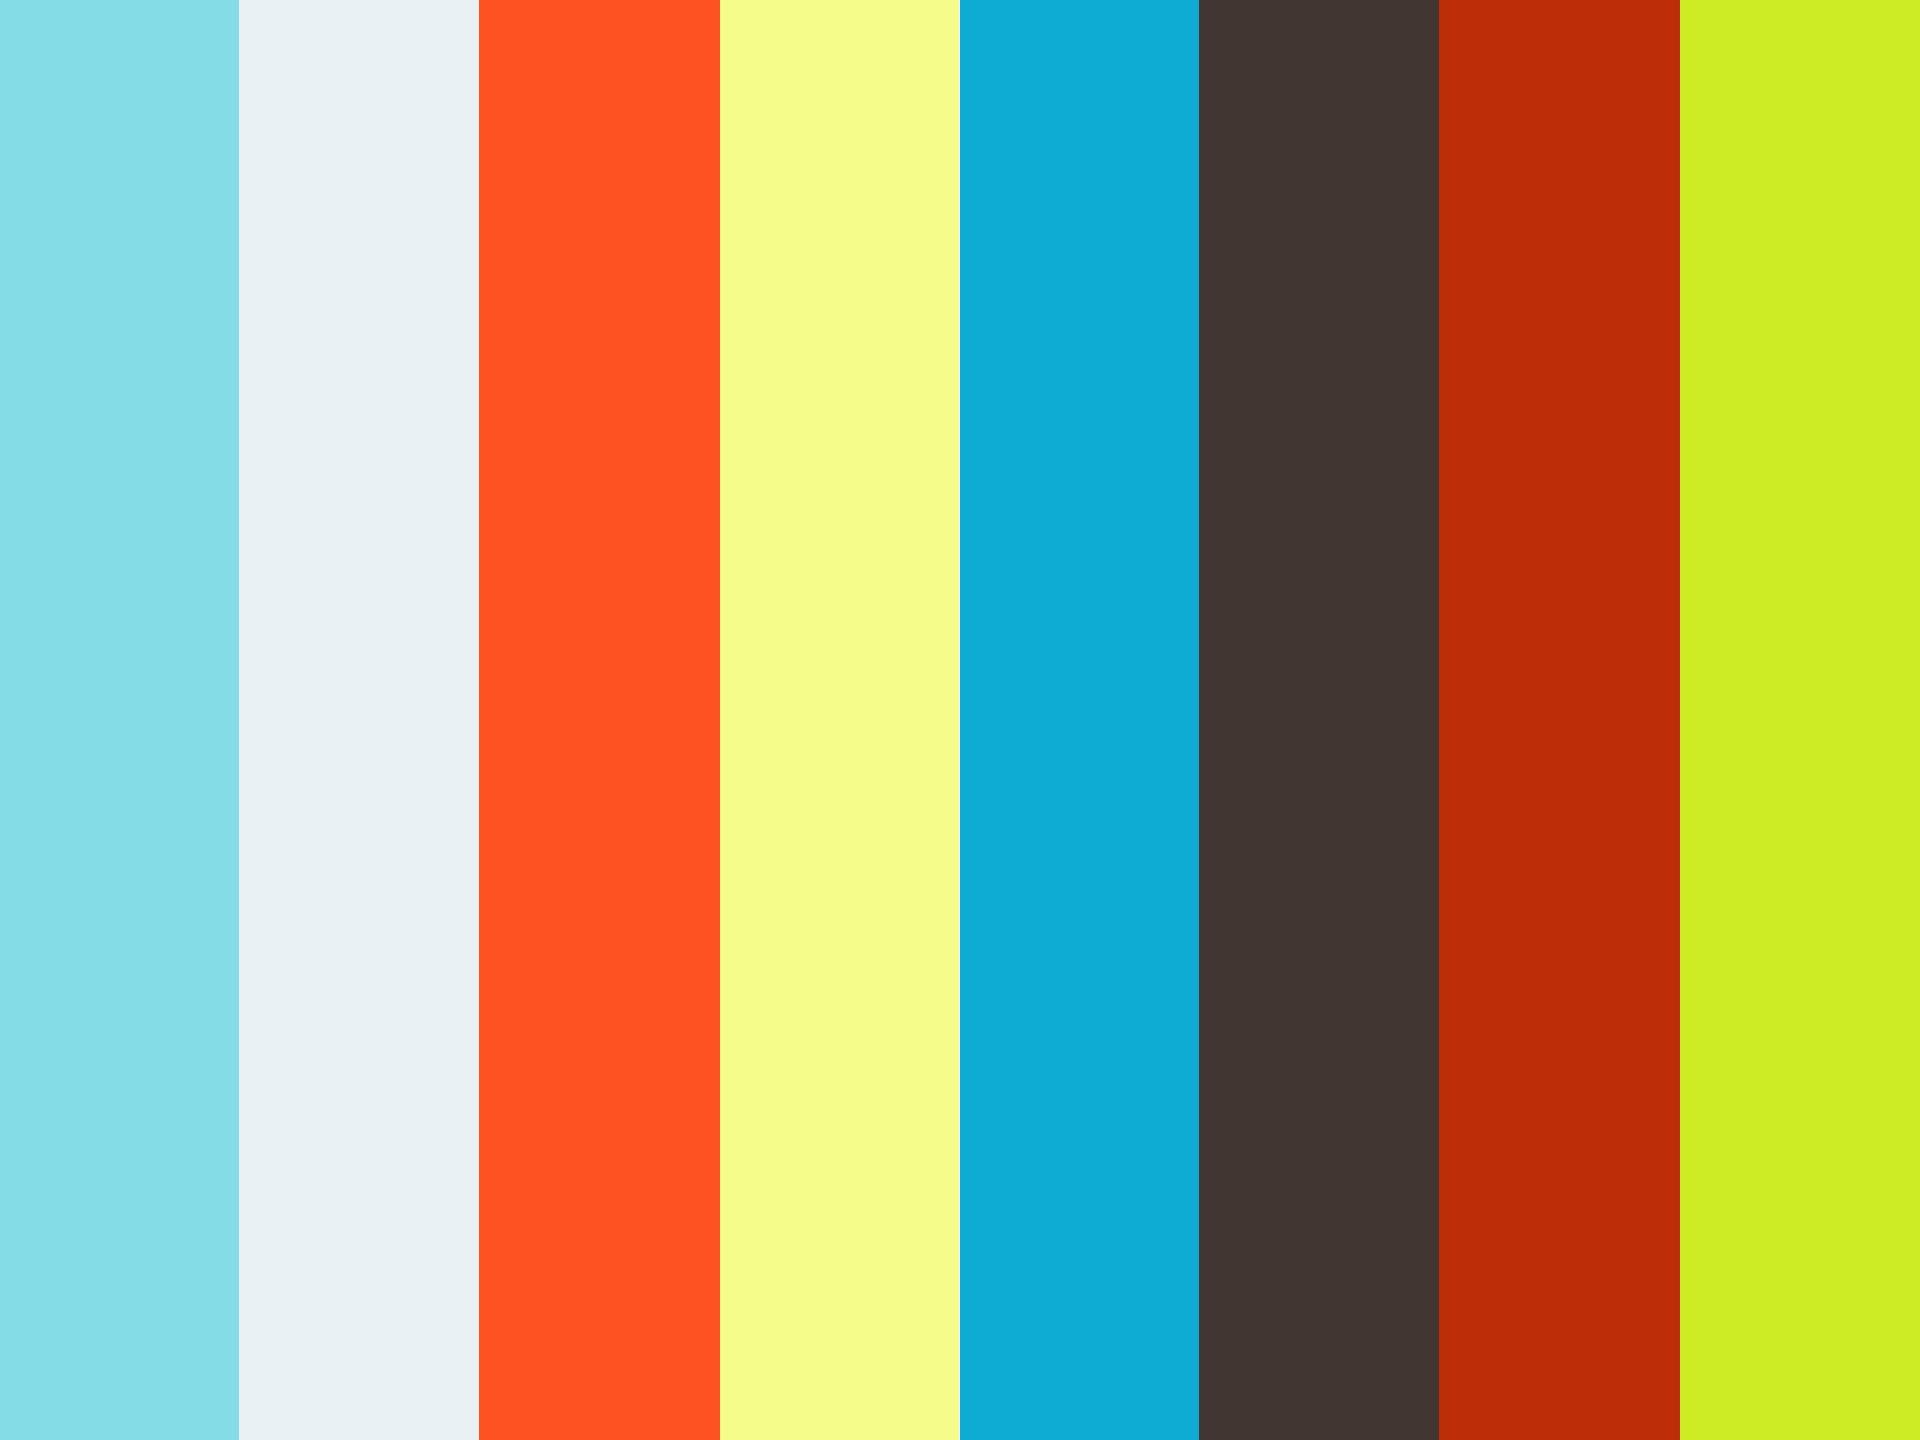 Pearson Vue Talks About Test Center Security On Vimeo. Office Desks For Cheap. Oak 4 Drawer Vertical File Cabinet. Kids Desk And Chair Combo. Clear Desk Blotter. Working Hotel Front Desk. Cutler Roll Top Desk For Sale. Side Bed Table. Corner Computer Desk White